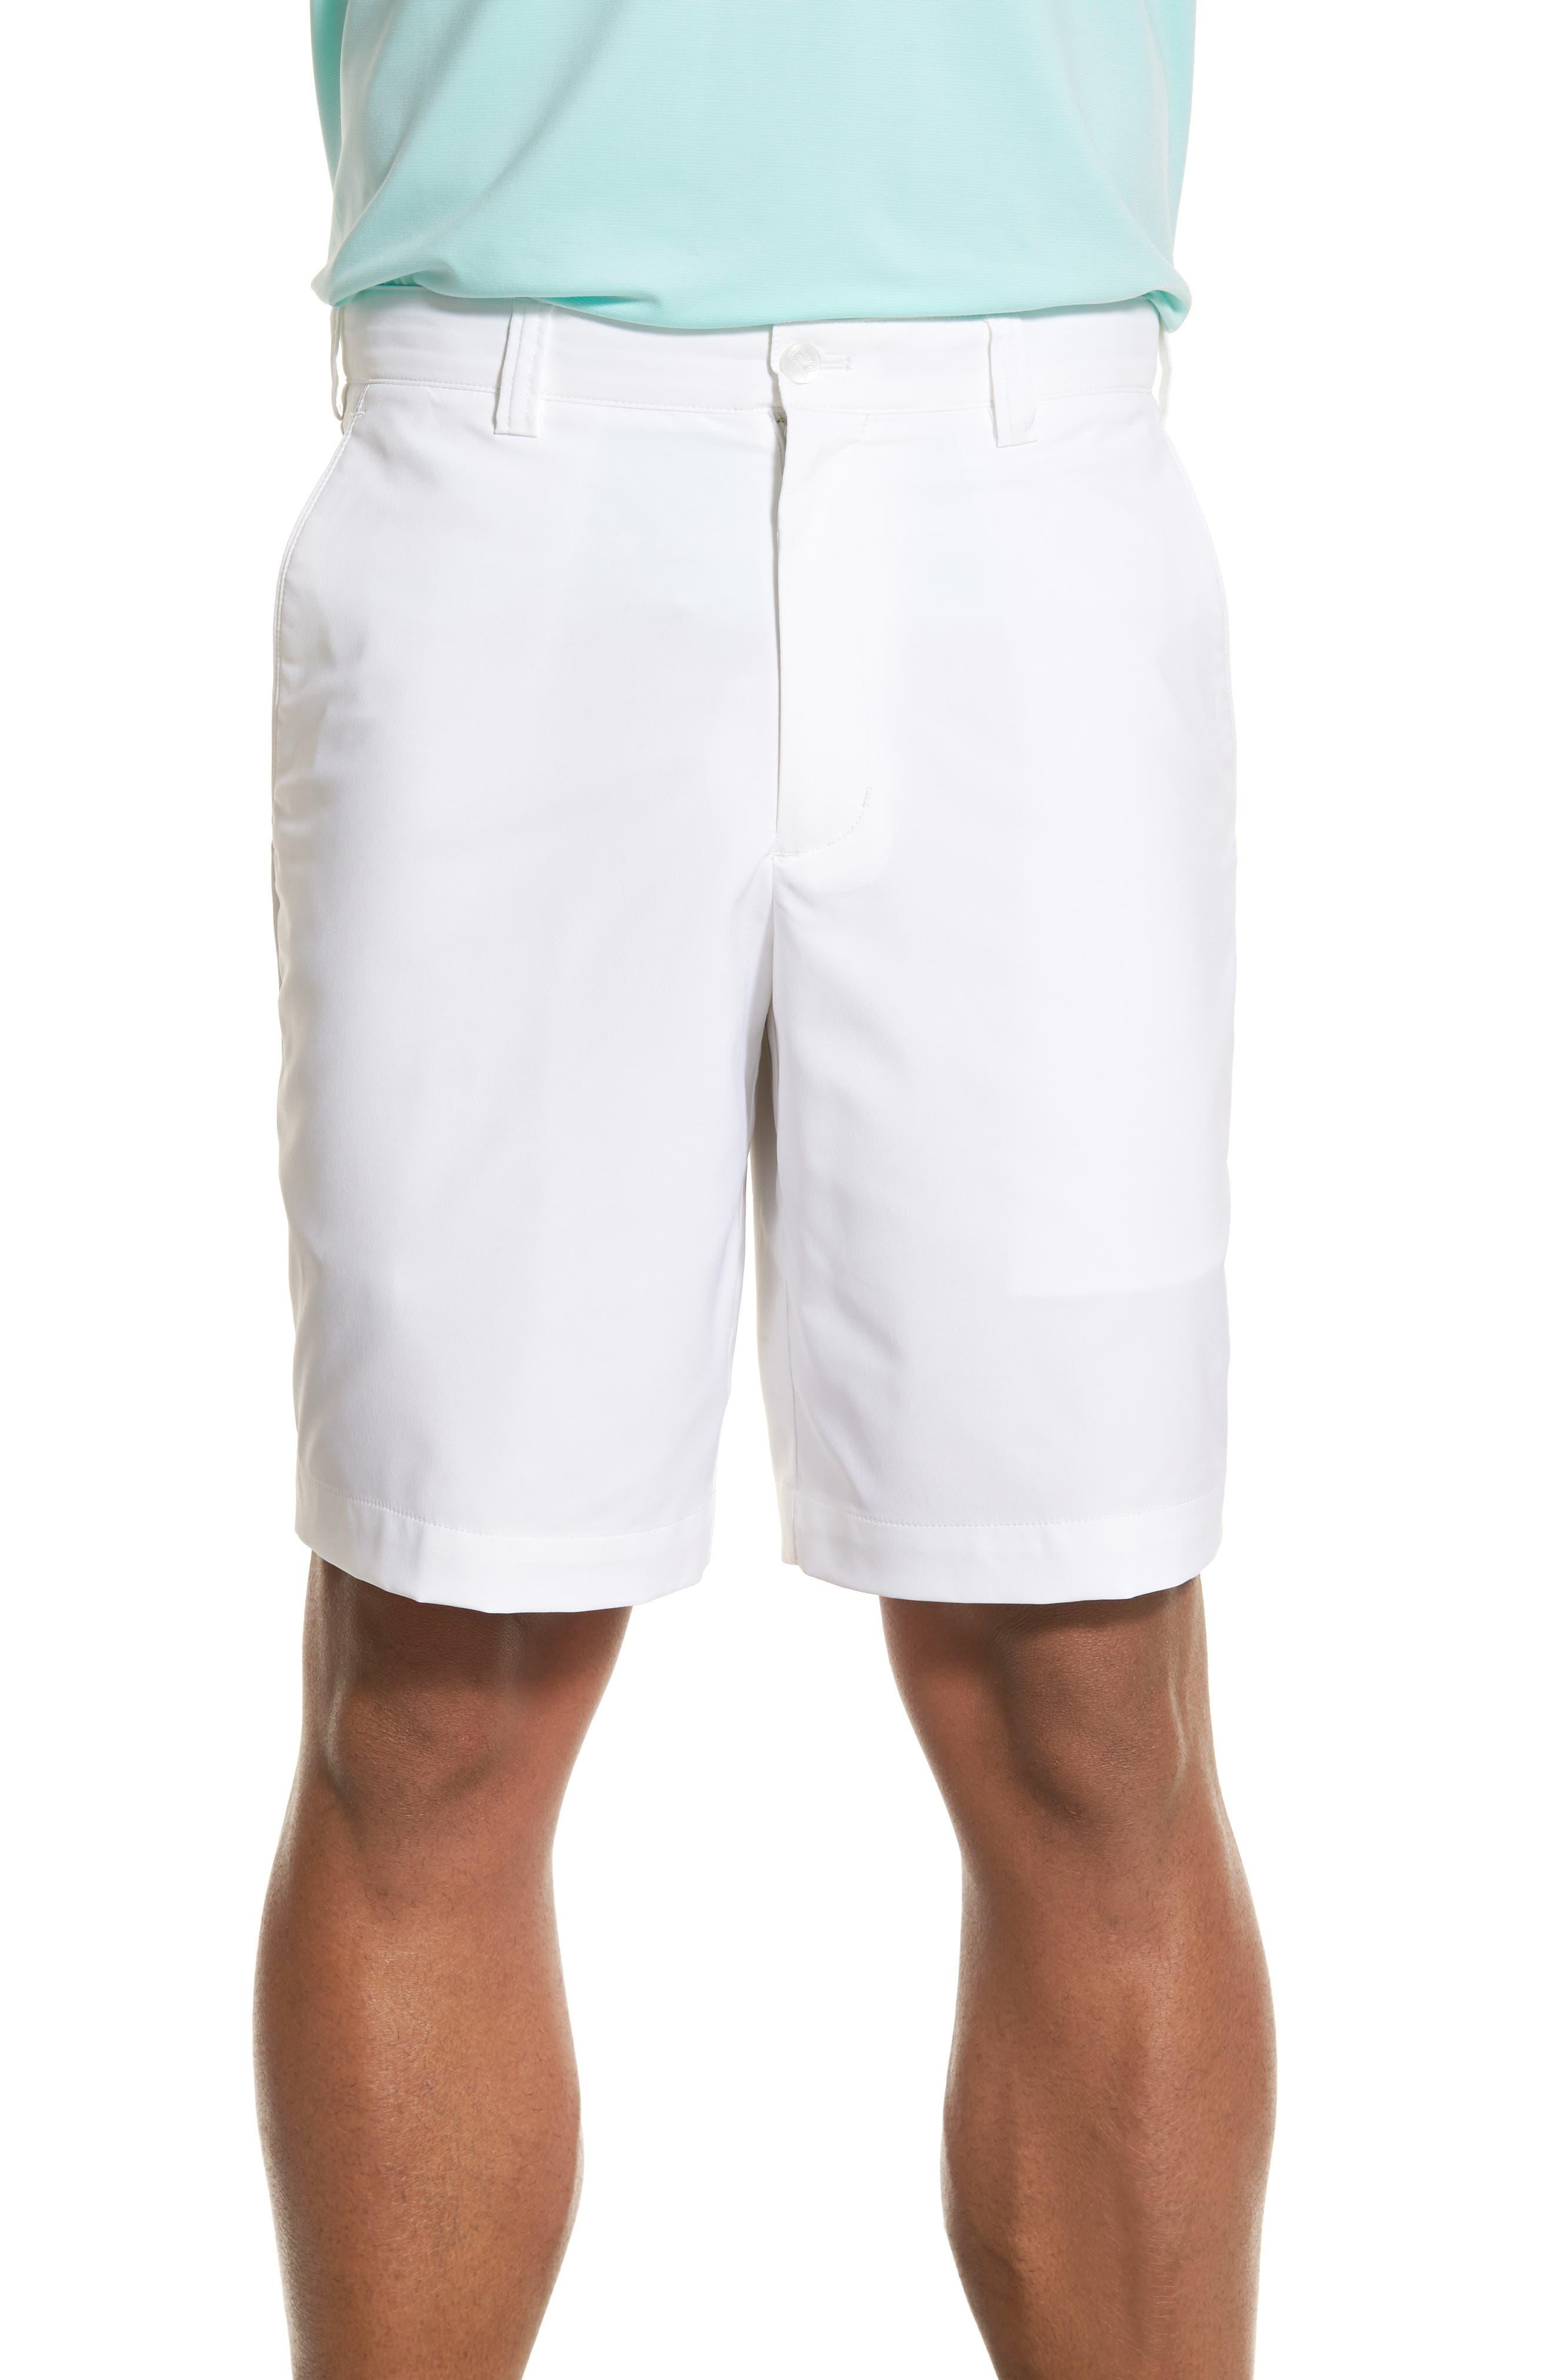 Bainbridge DryTec Flat Front Shorts,                         Main,                         color, White